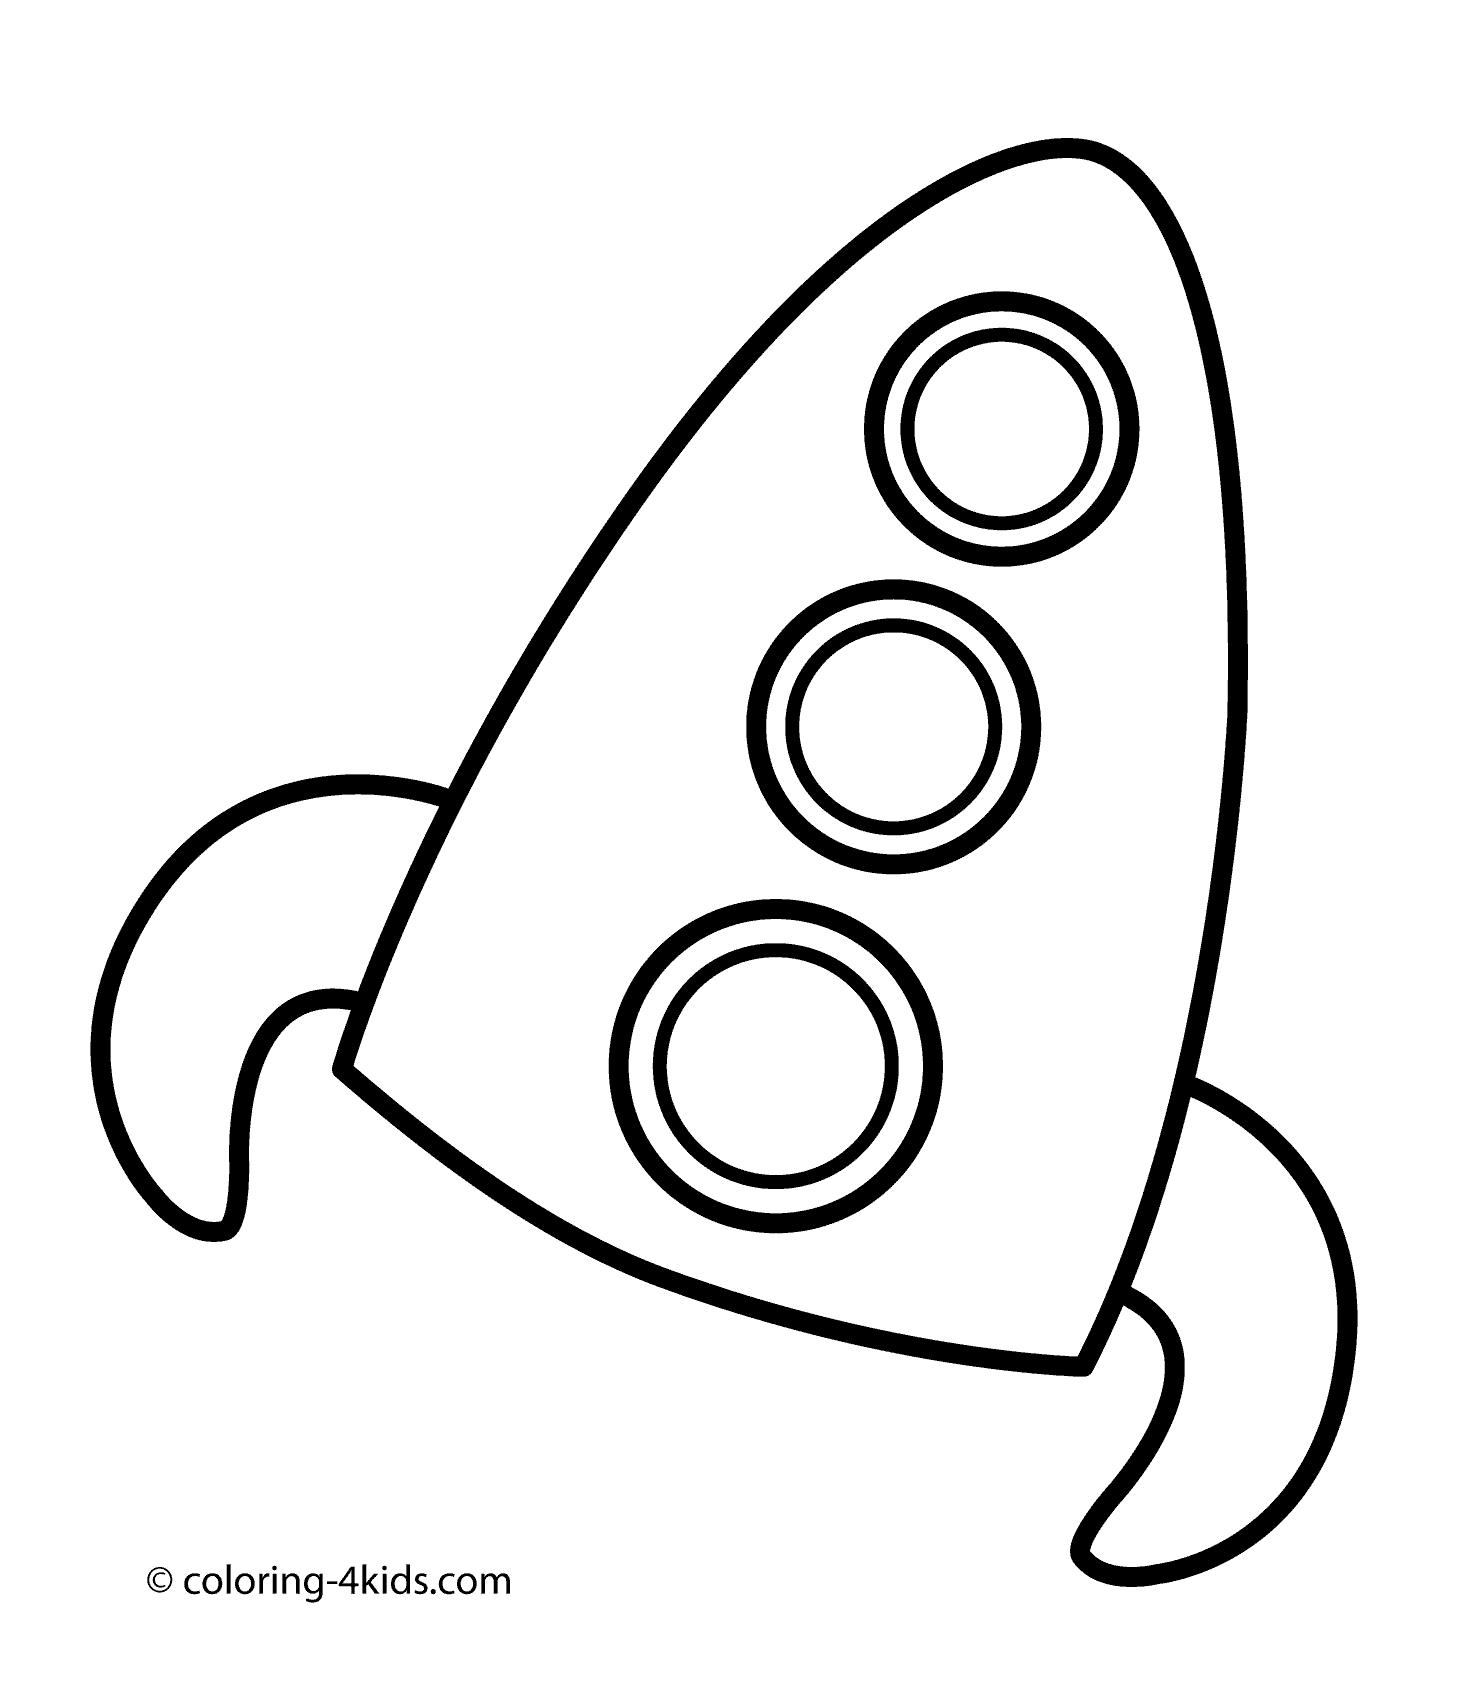 1483x1684 Rocket